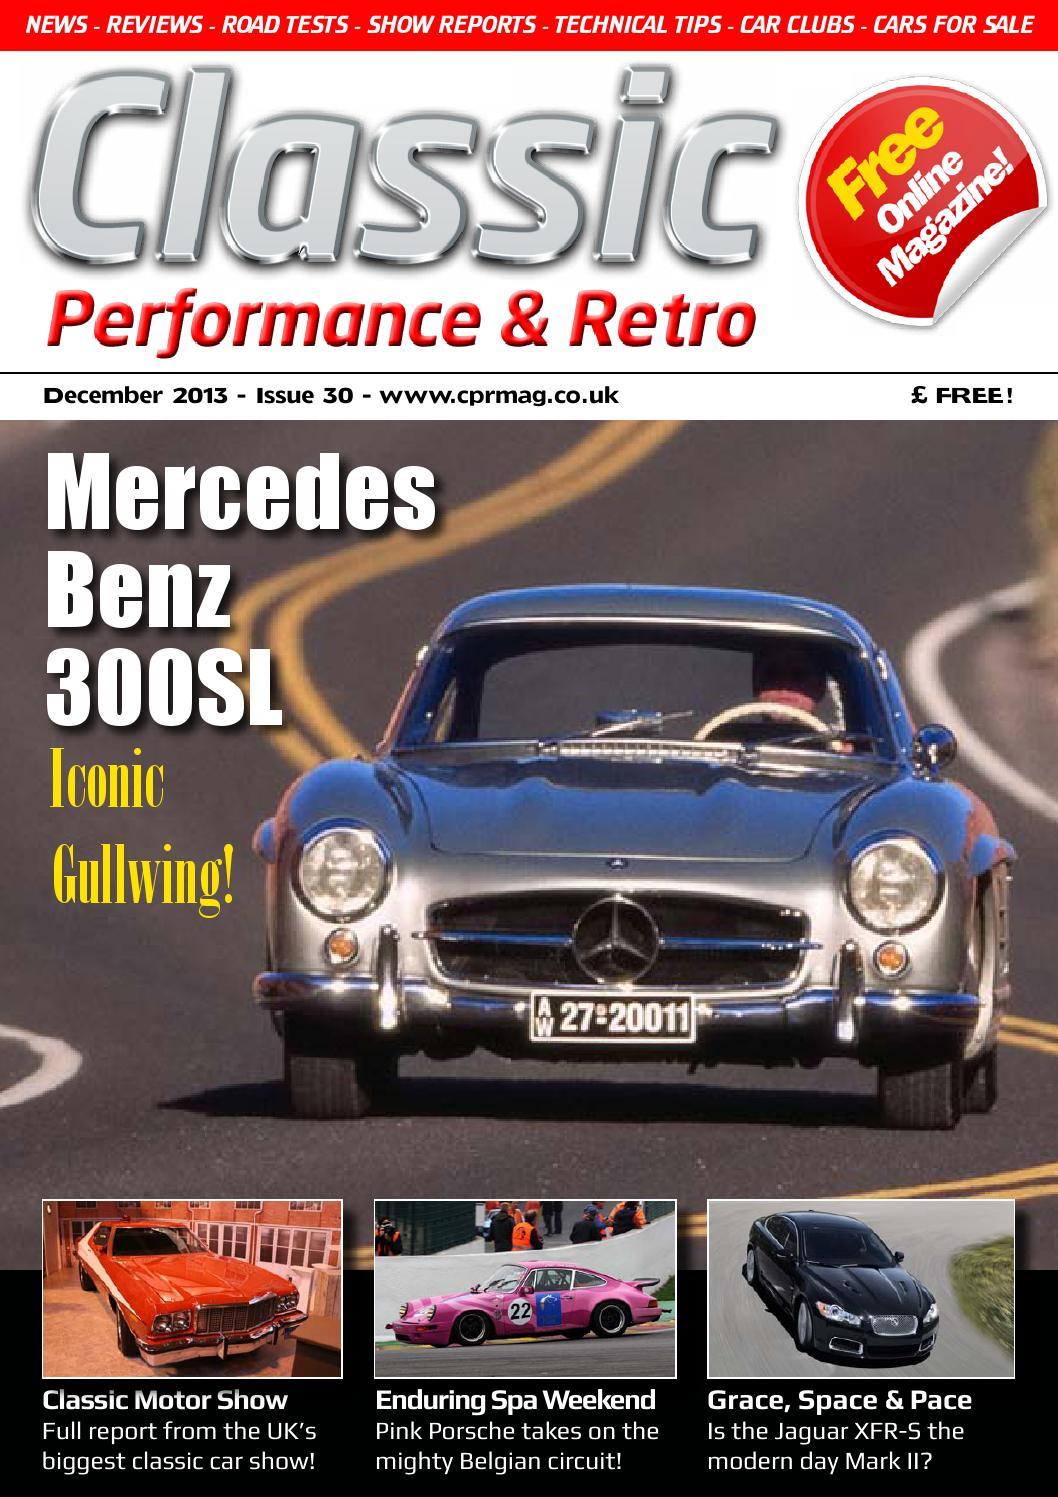 Classic, Performance & Retro December 2013 by AV8 publishing